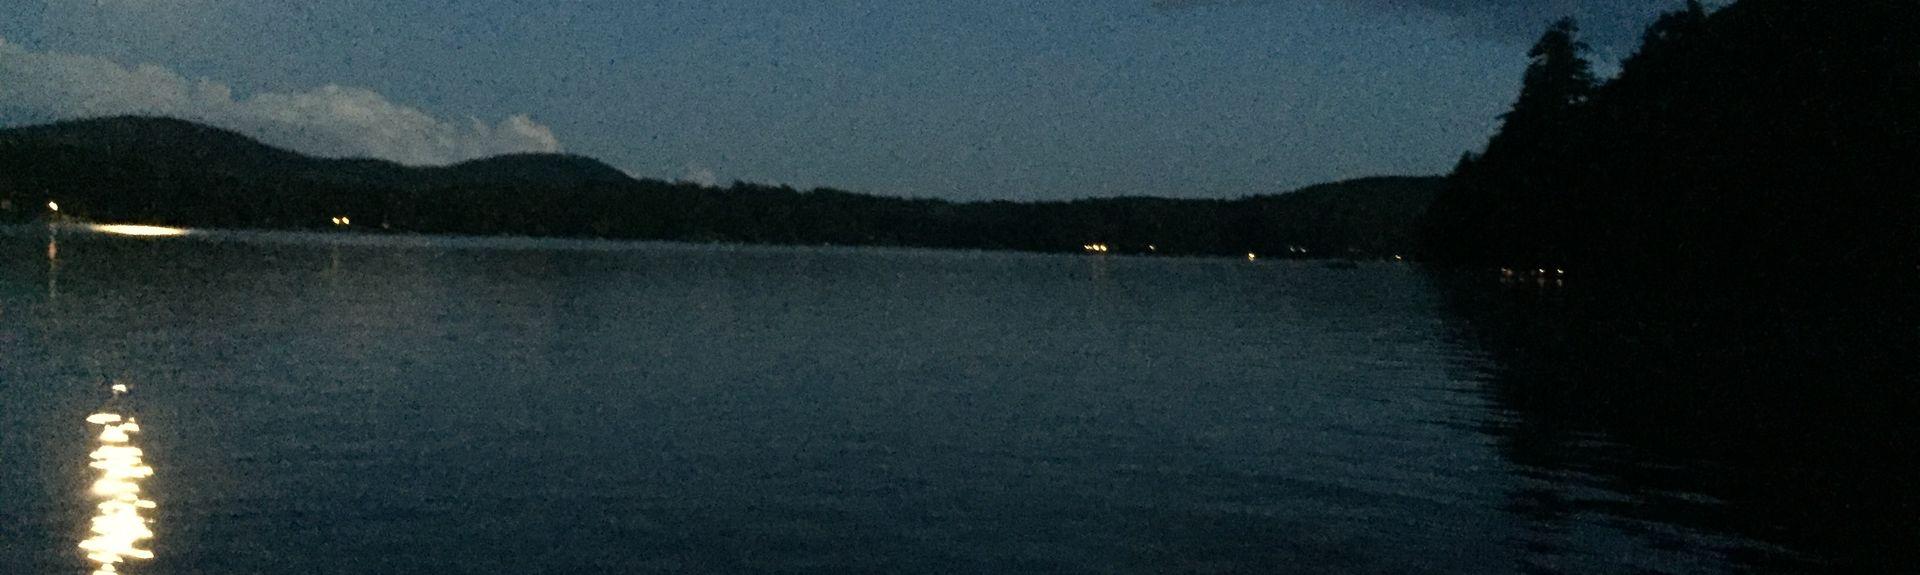 Lake George Steamboat Company, Lake George, NY, USA